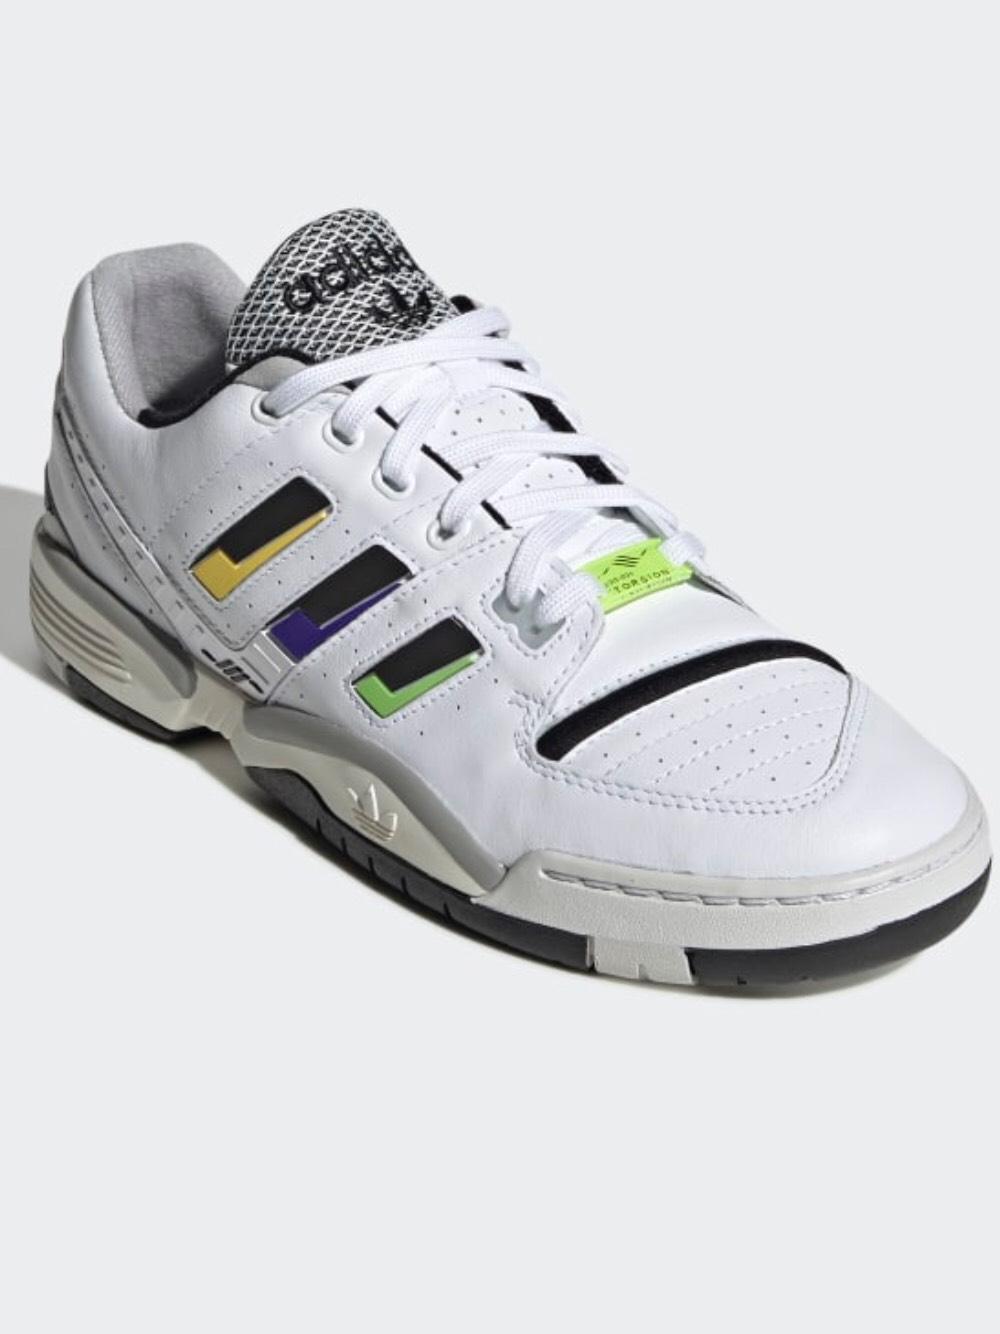 Adidas Torsion Comp Tennis shoe (UK3.5-13.5) @ adidas £33.73 + £3.99 postage